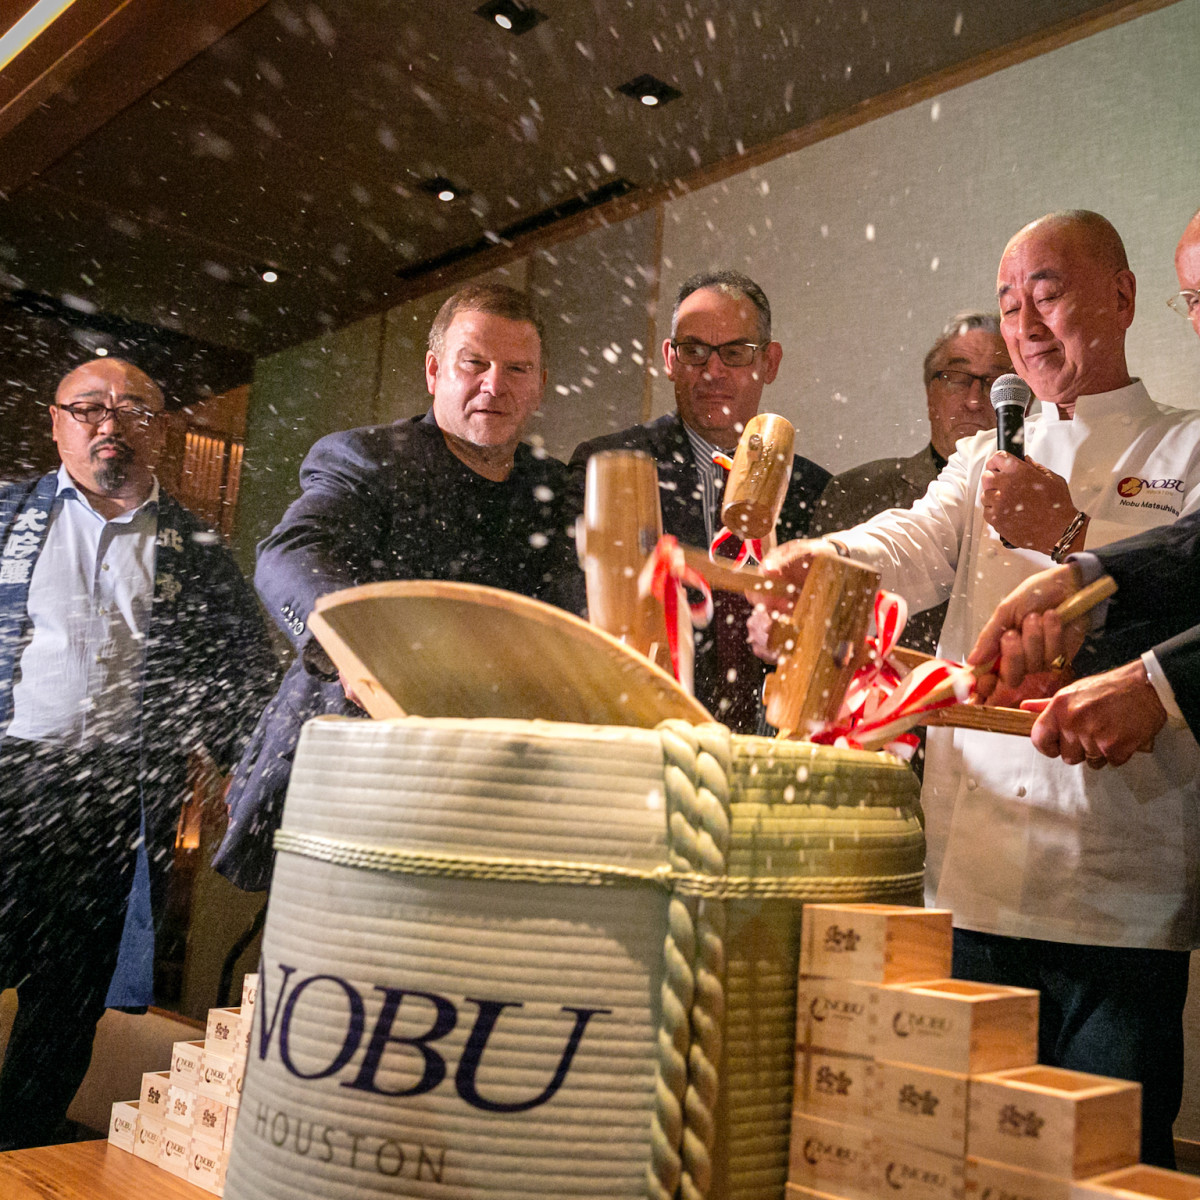 Nobu opening party barrel opening